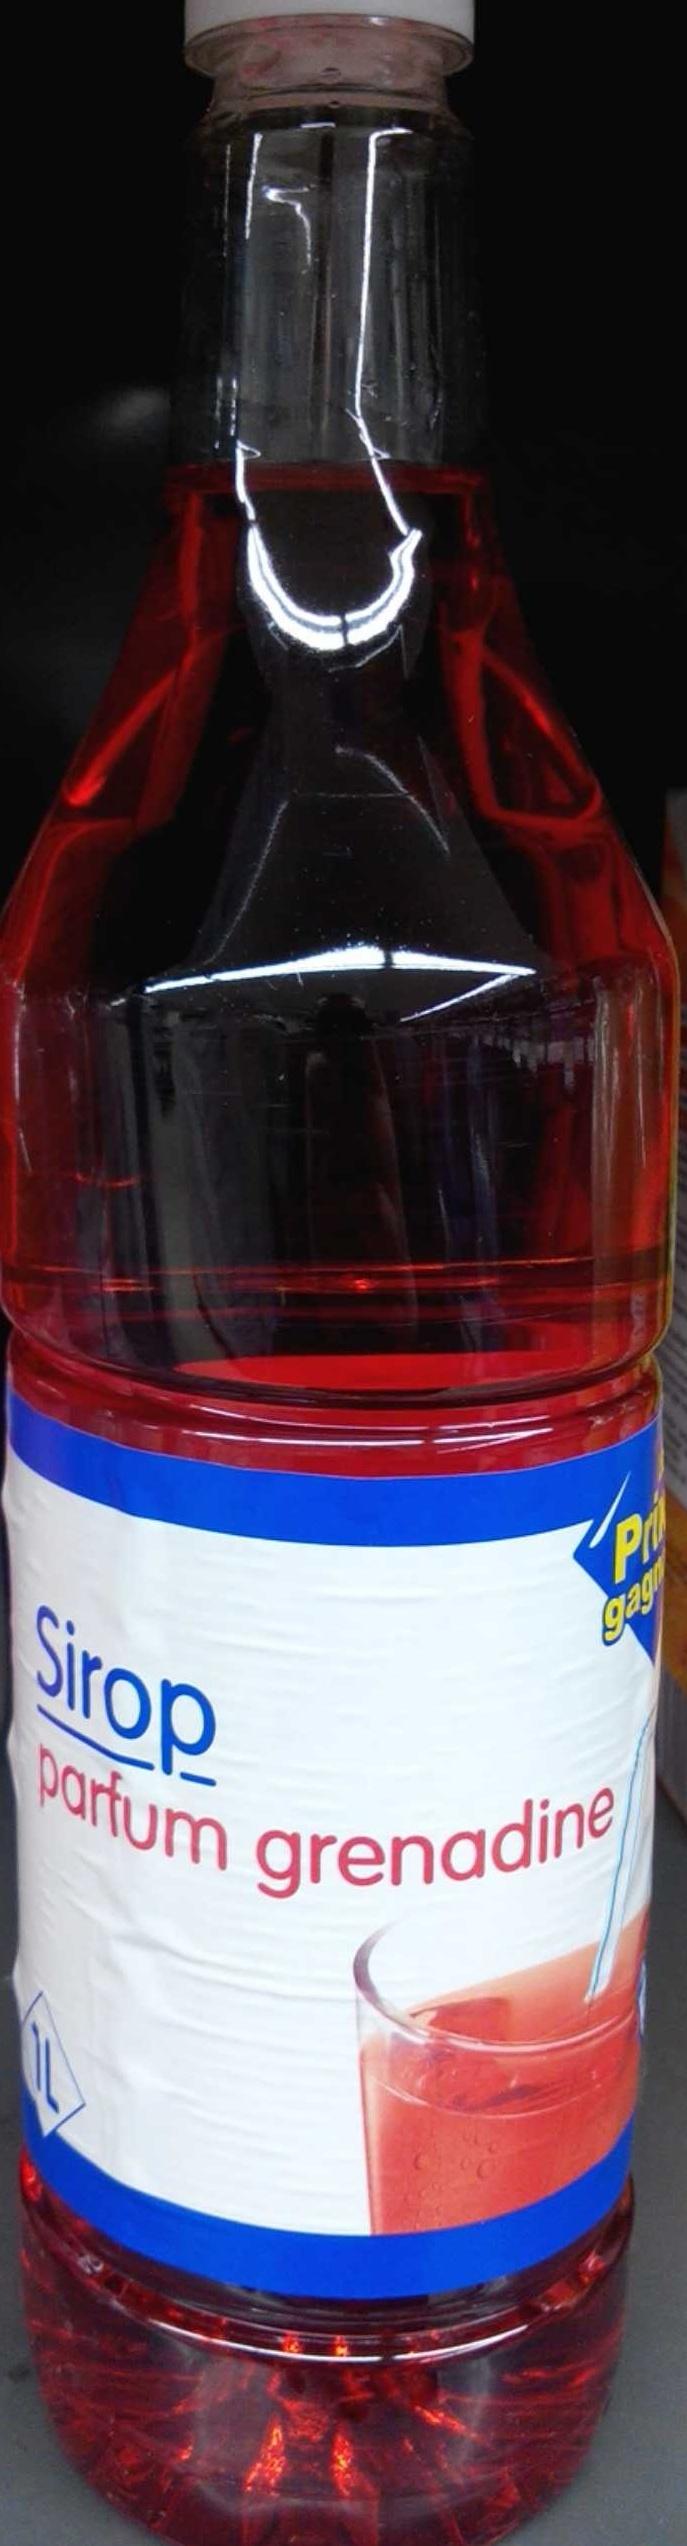 Sirop parfum grenadine - Produit - fr